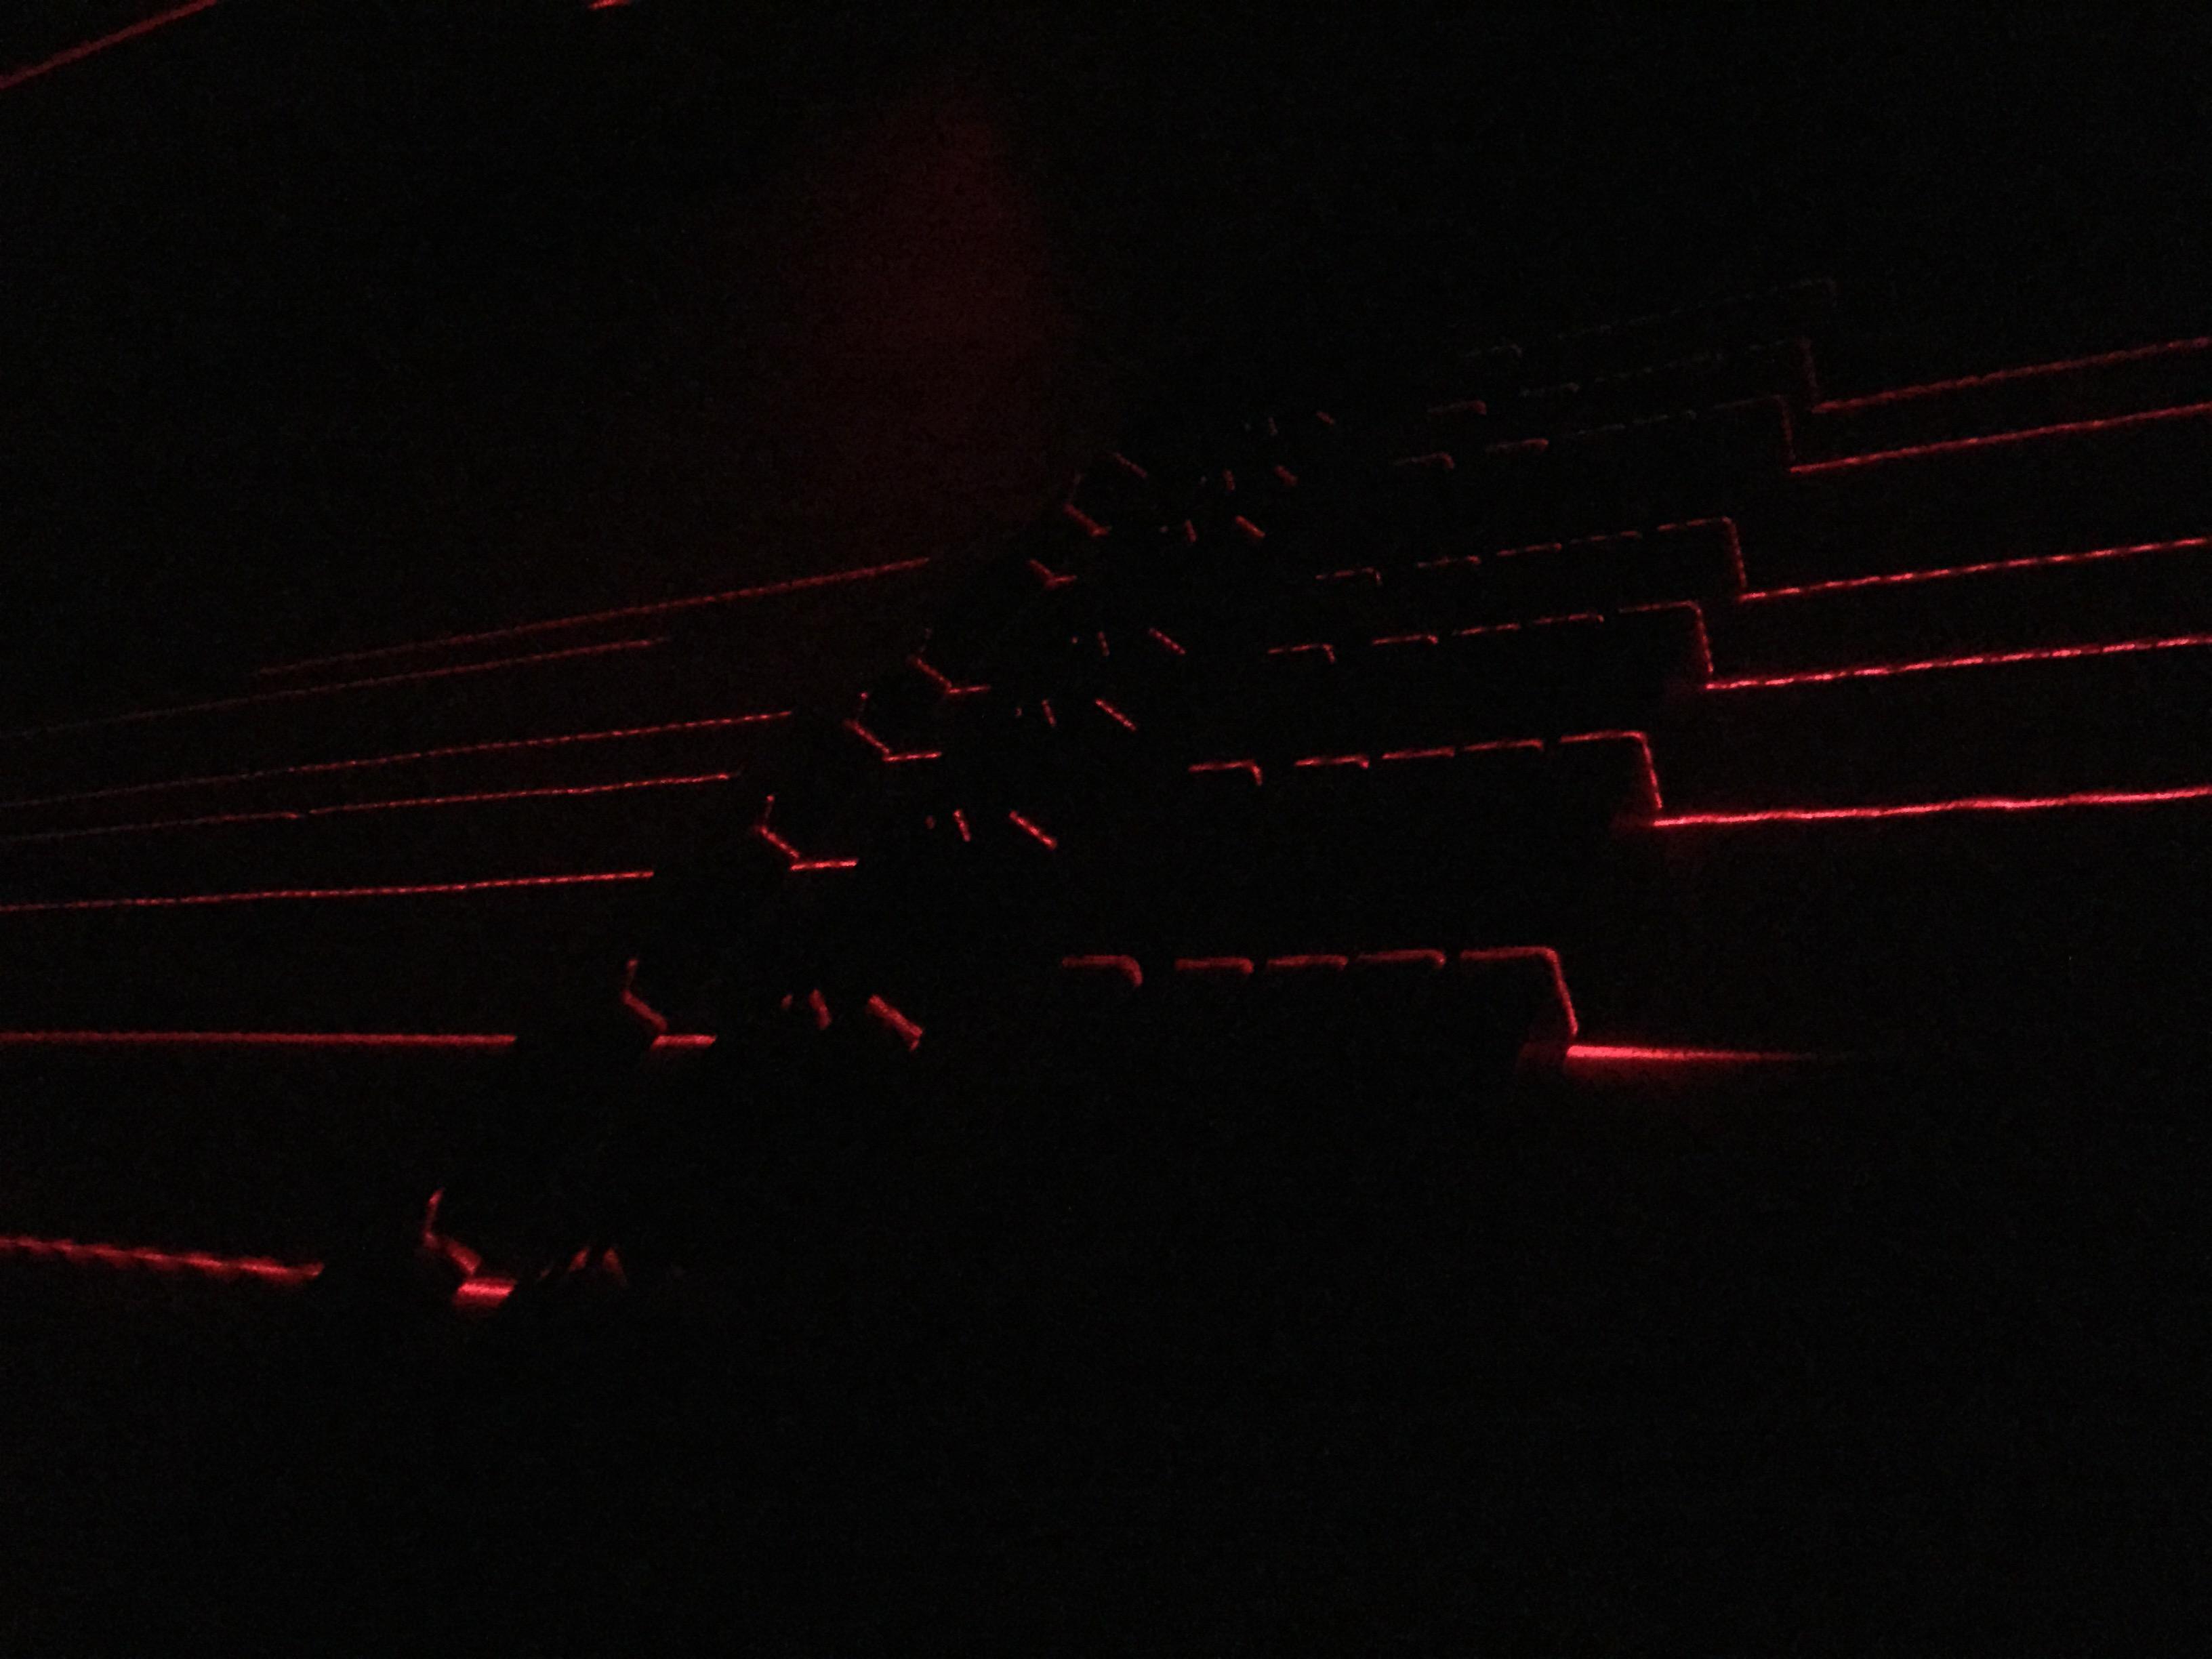 Lasermatrix-6